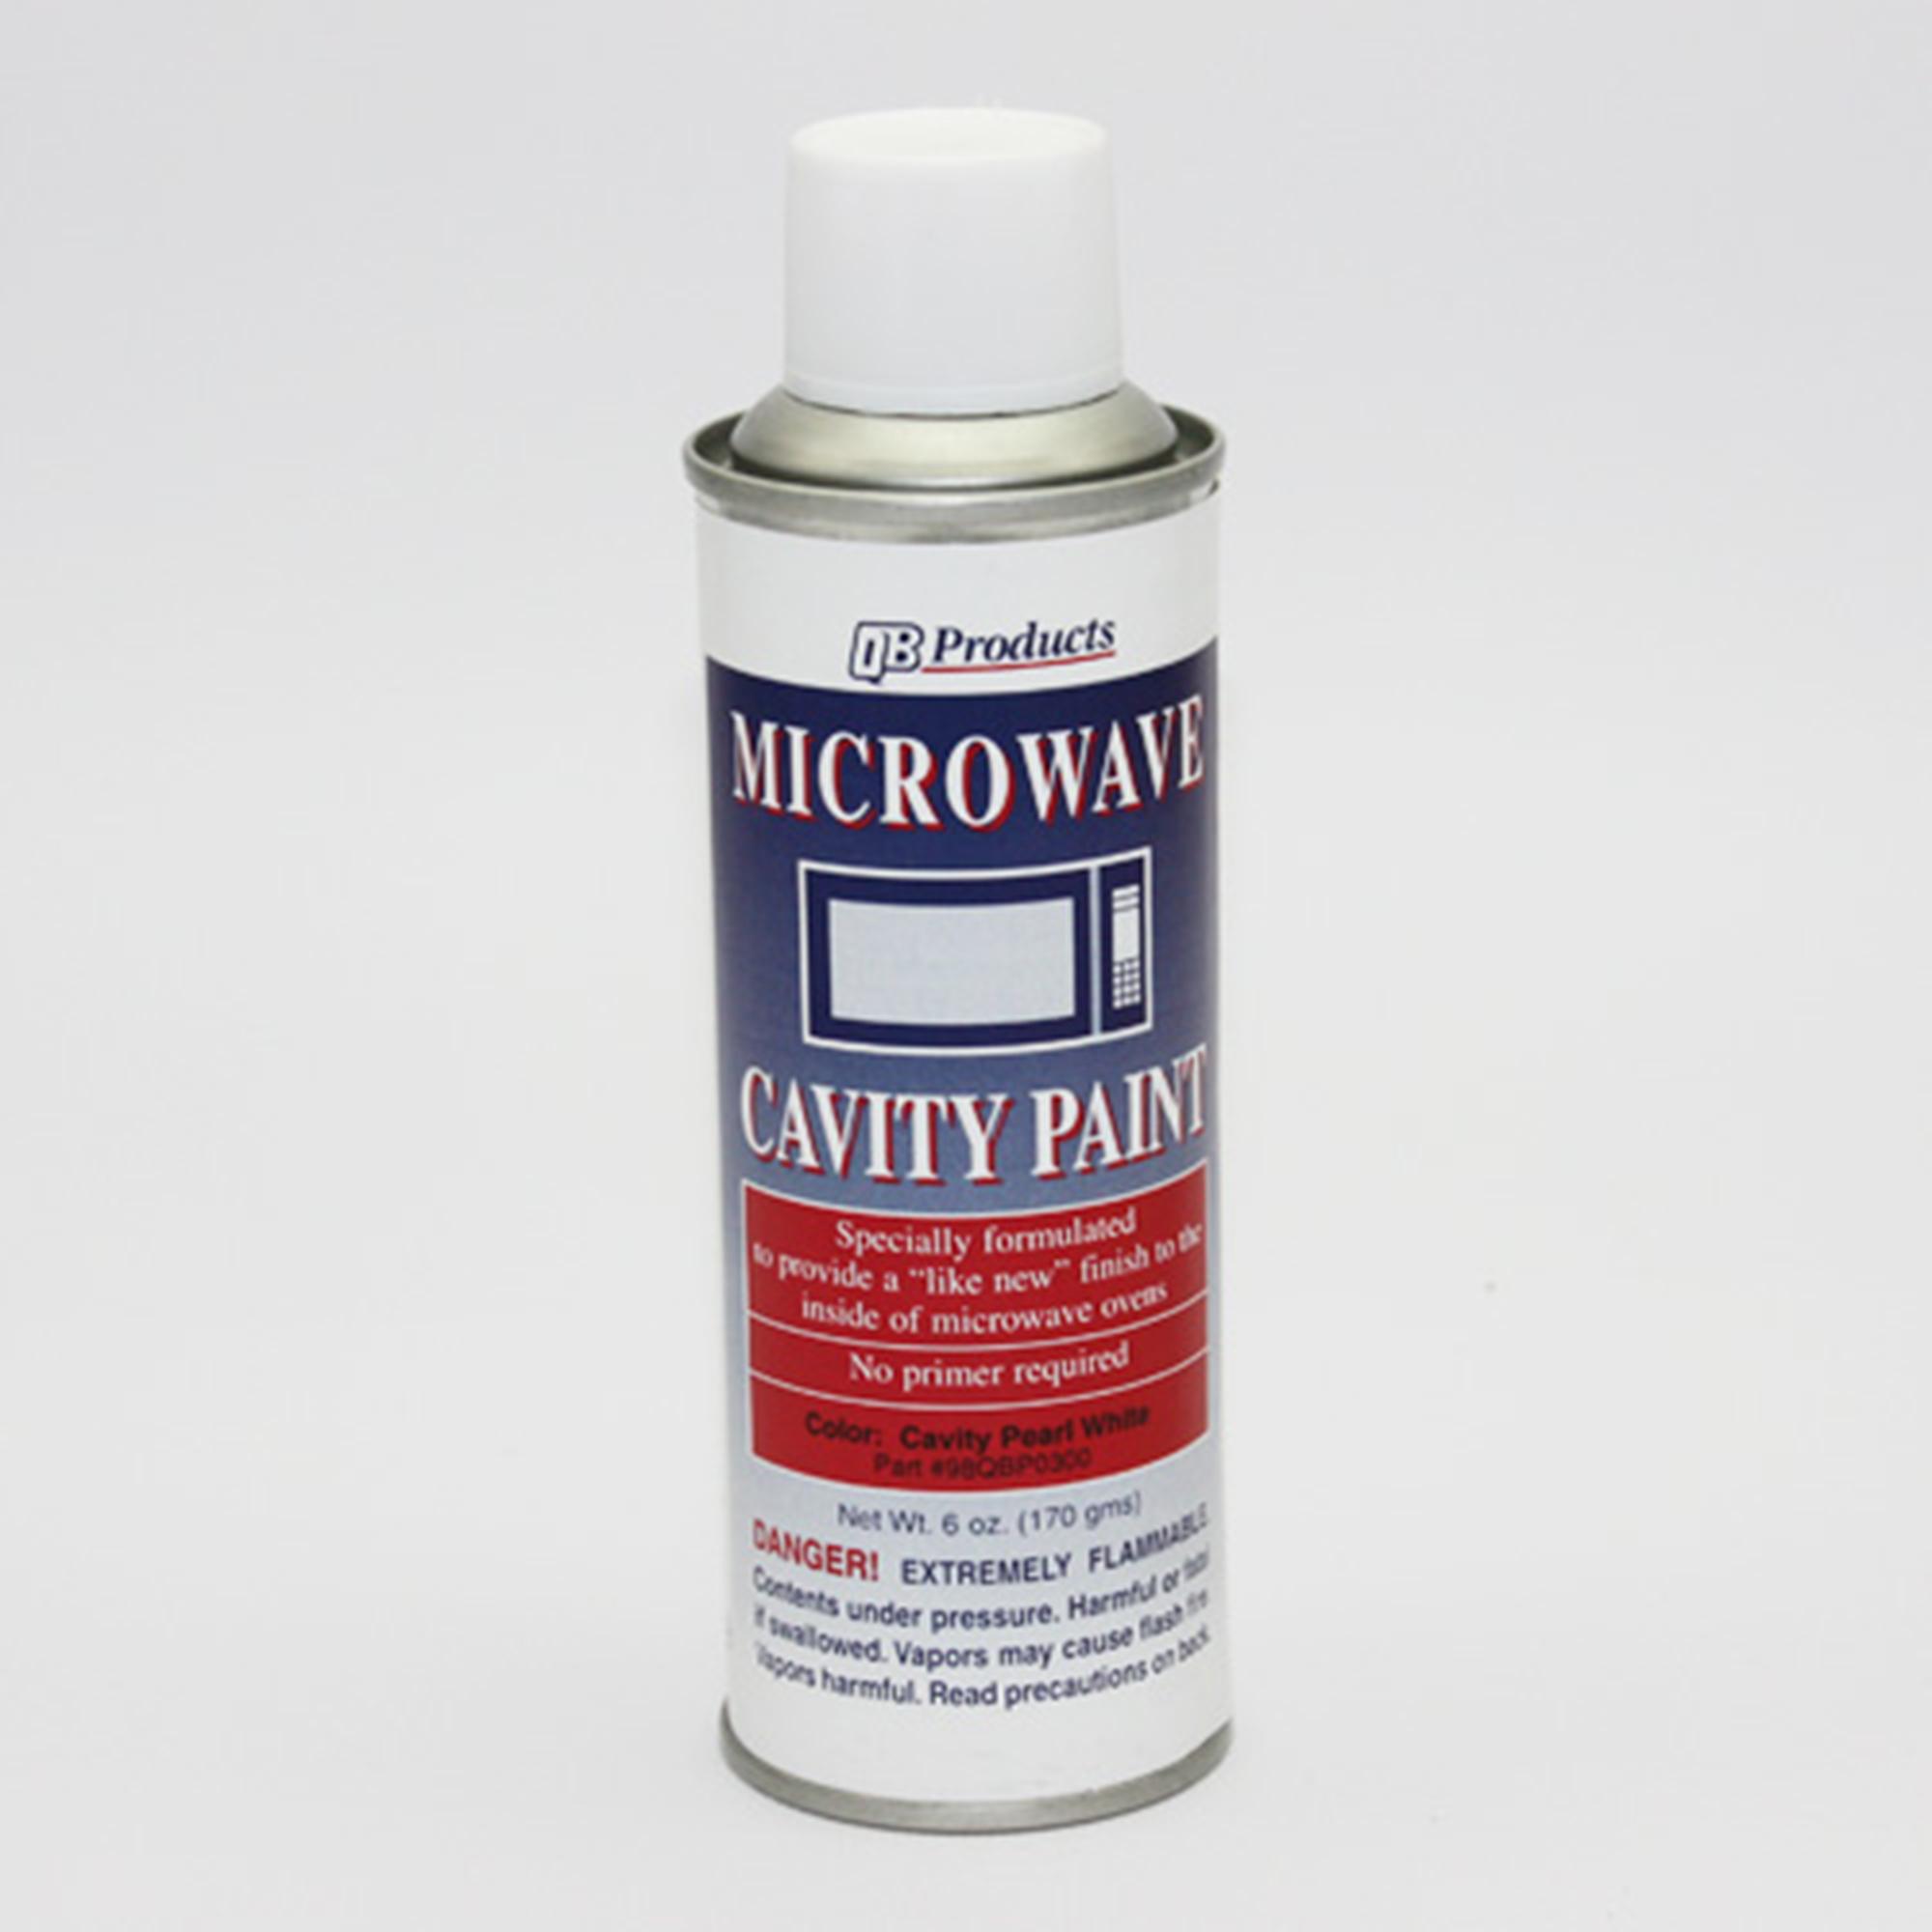 Pearl White Microwave Cavity Paint 98qbp0300 Universal New Ebay